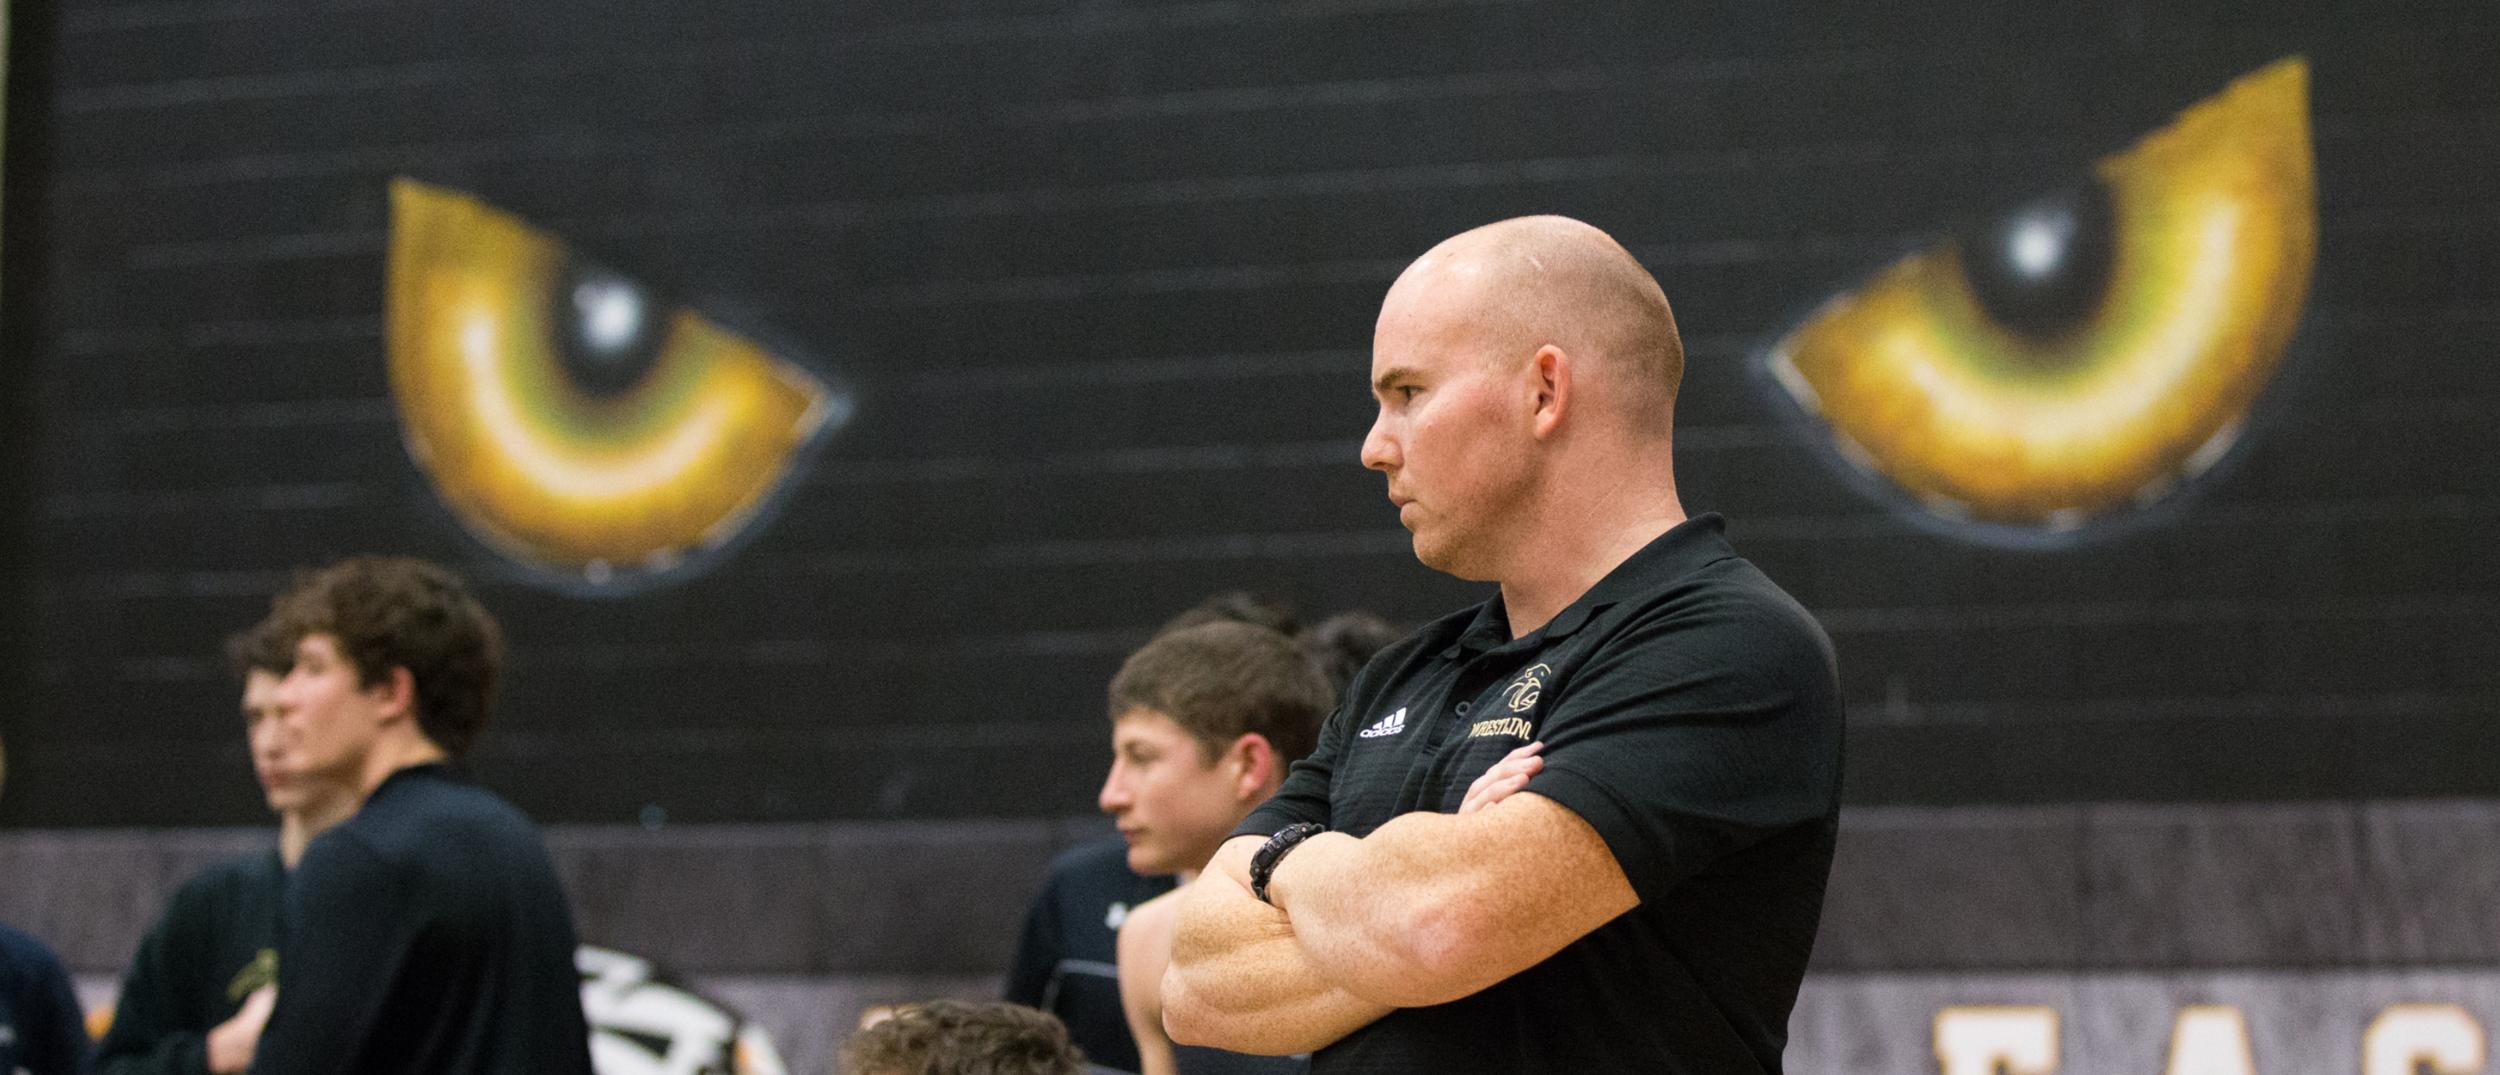 PESH head coach Bryan Kenney watches a match vs Lovejoy